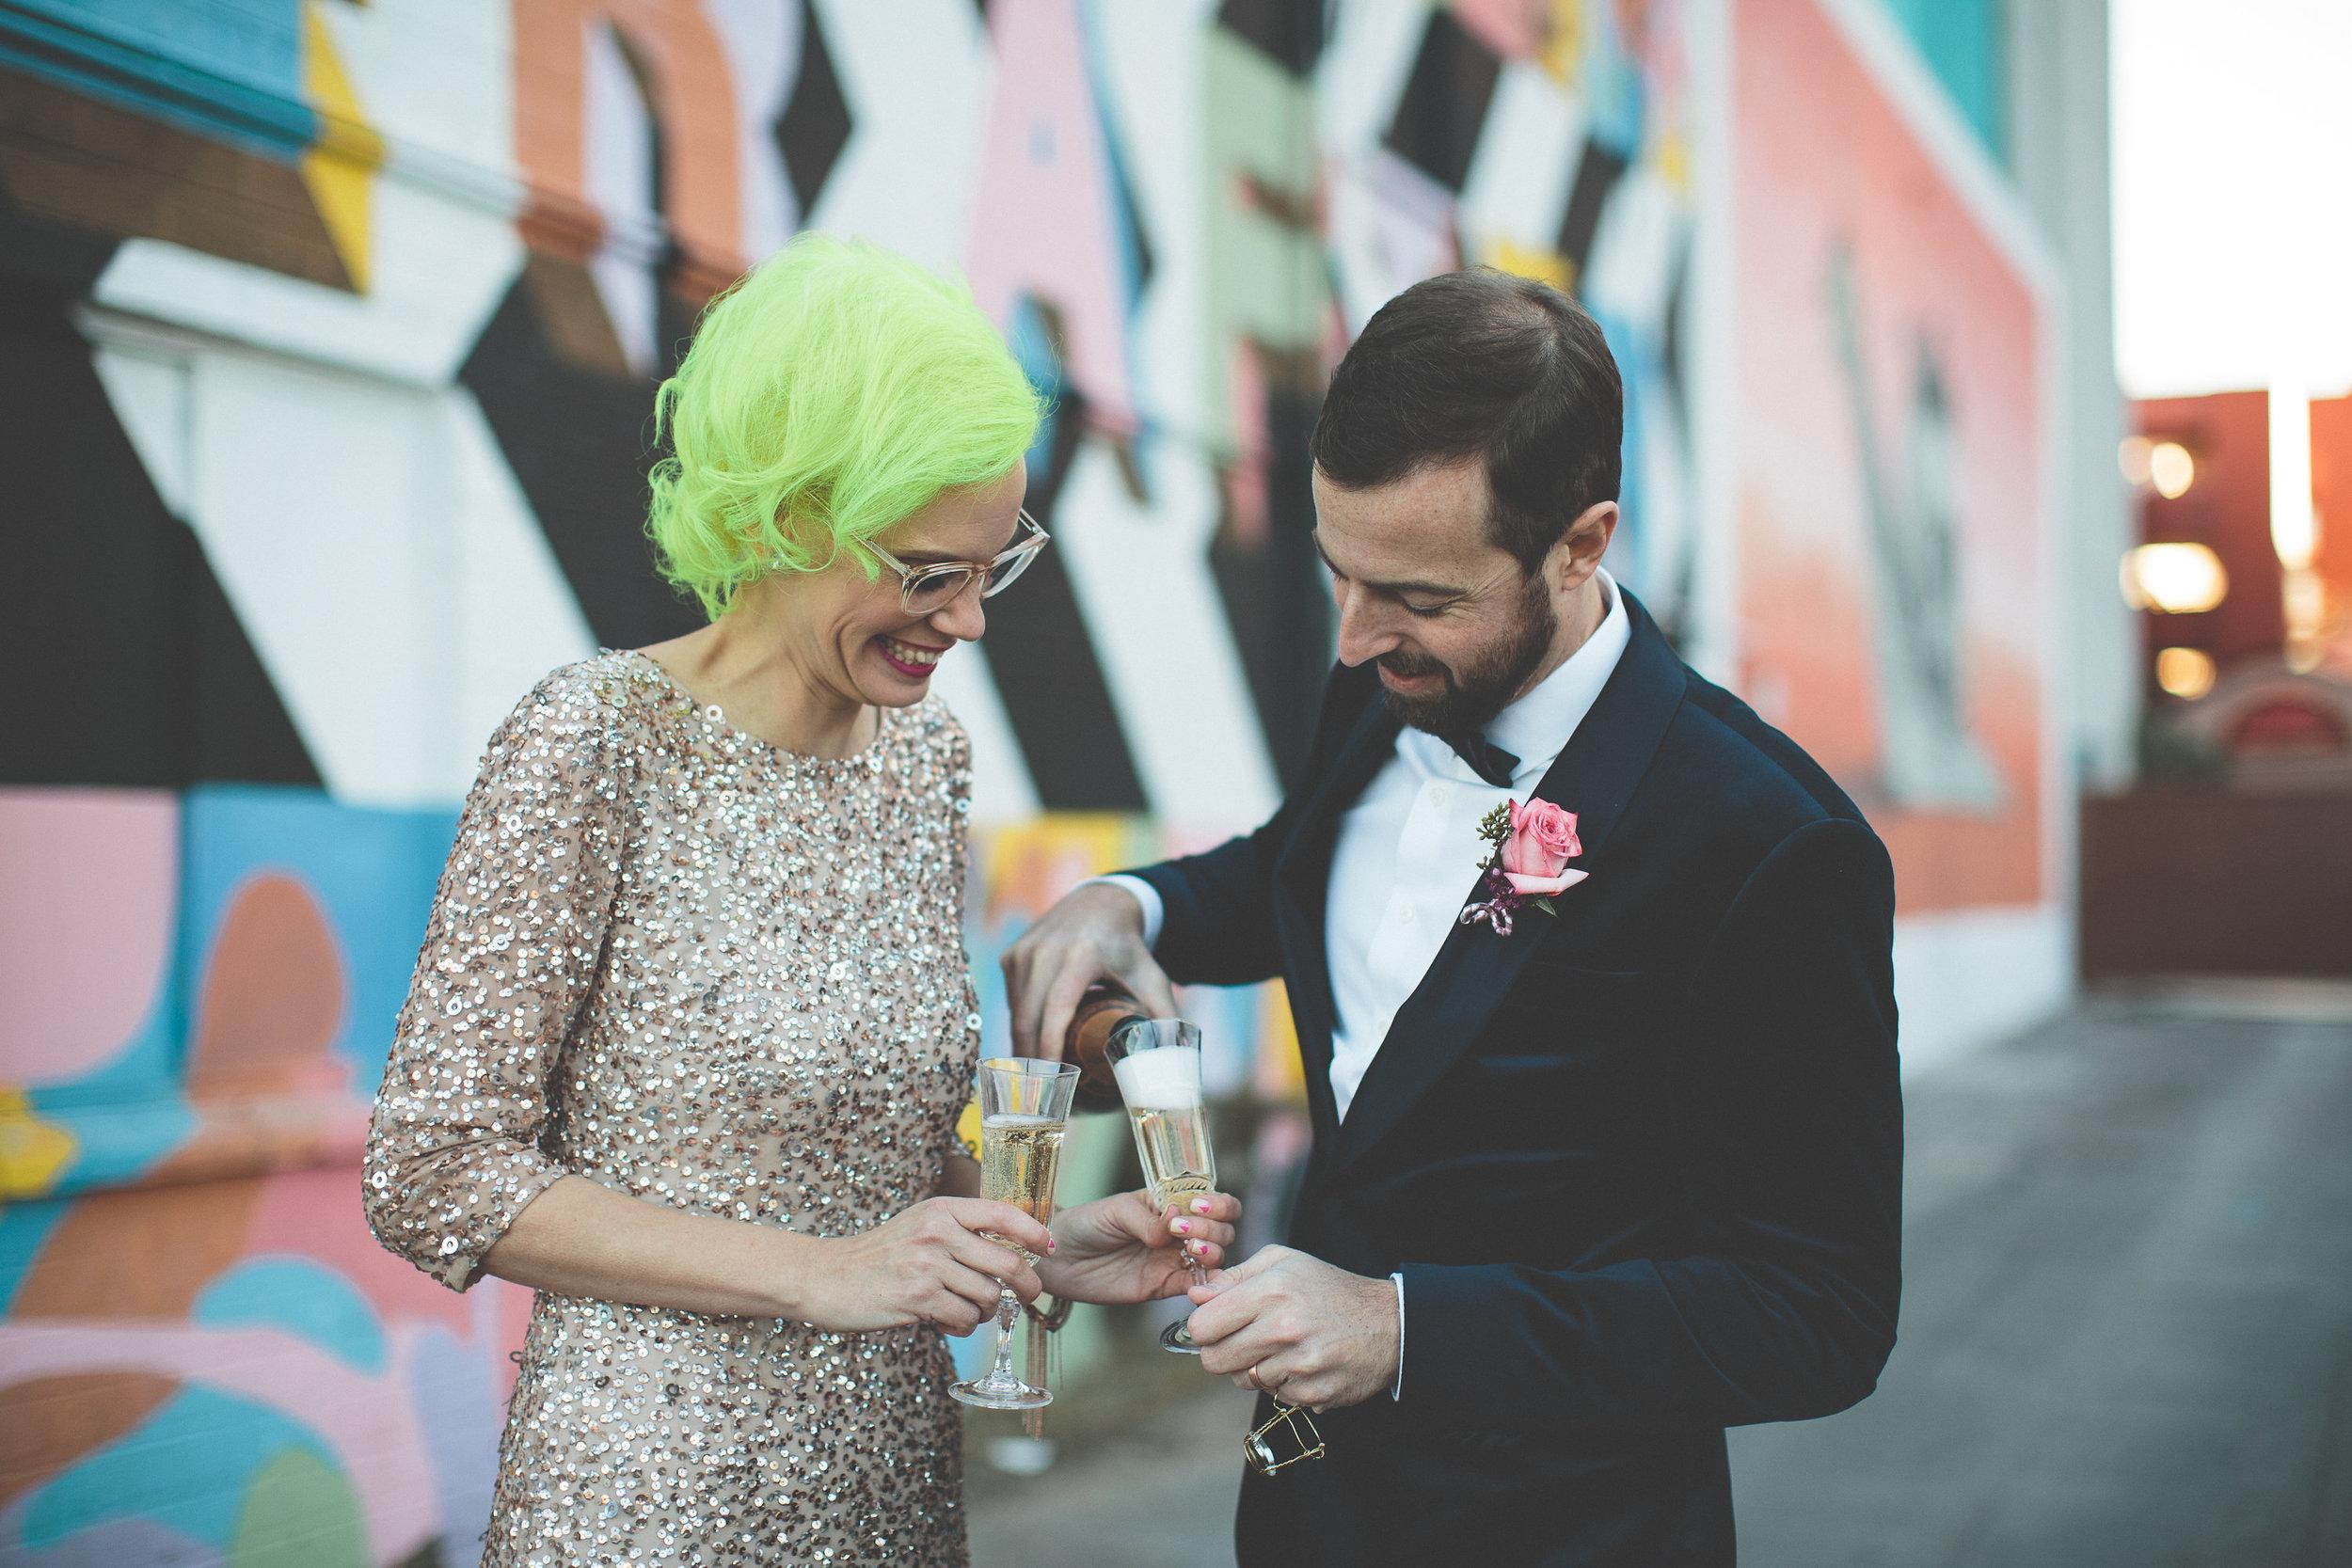 katie-and-erics-bright-downtown-las-vegas-elopement28.jpg